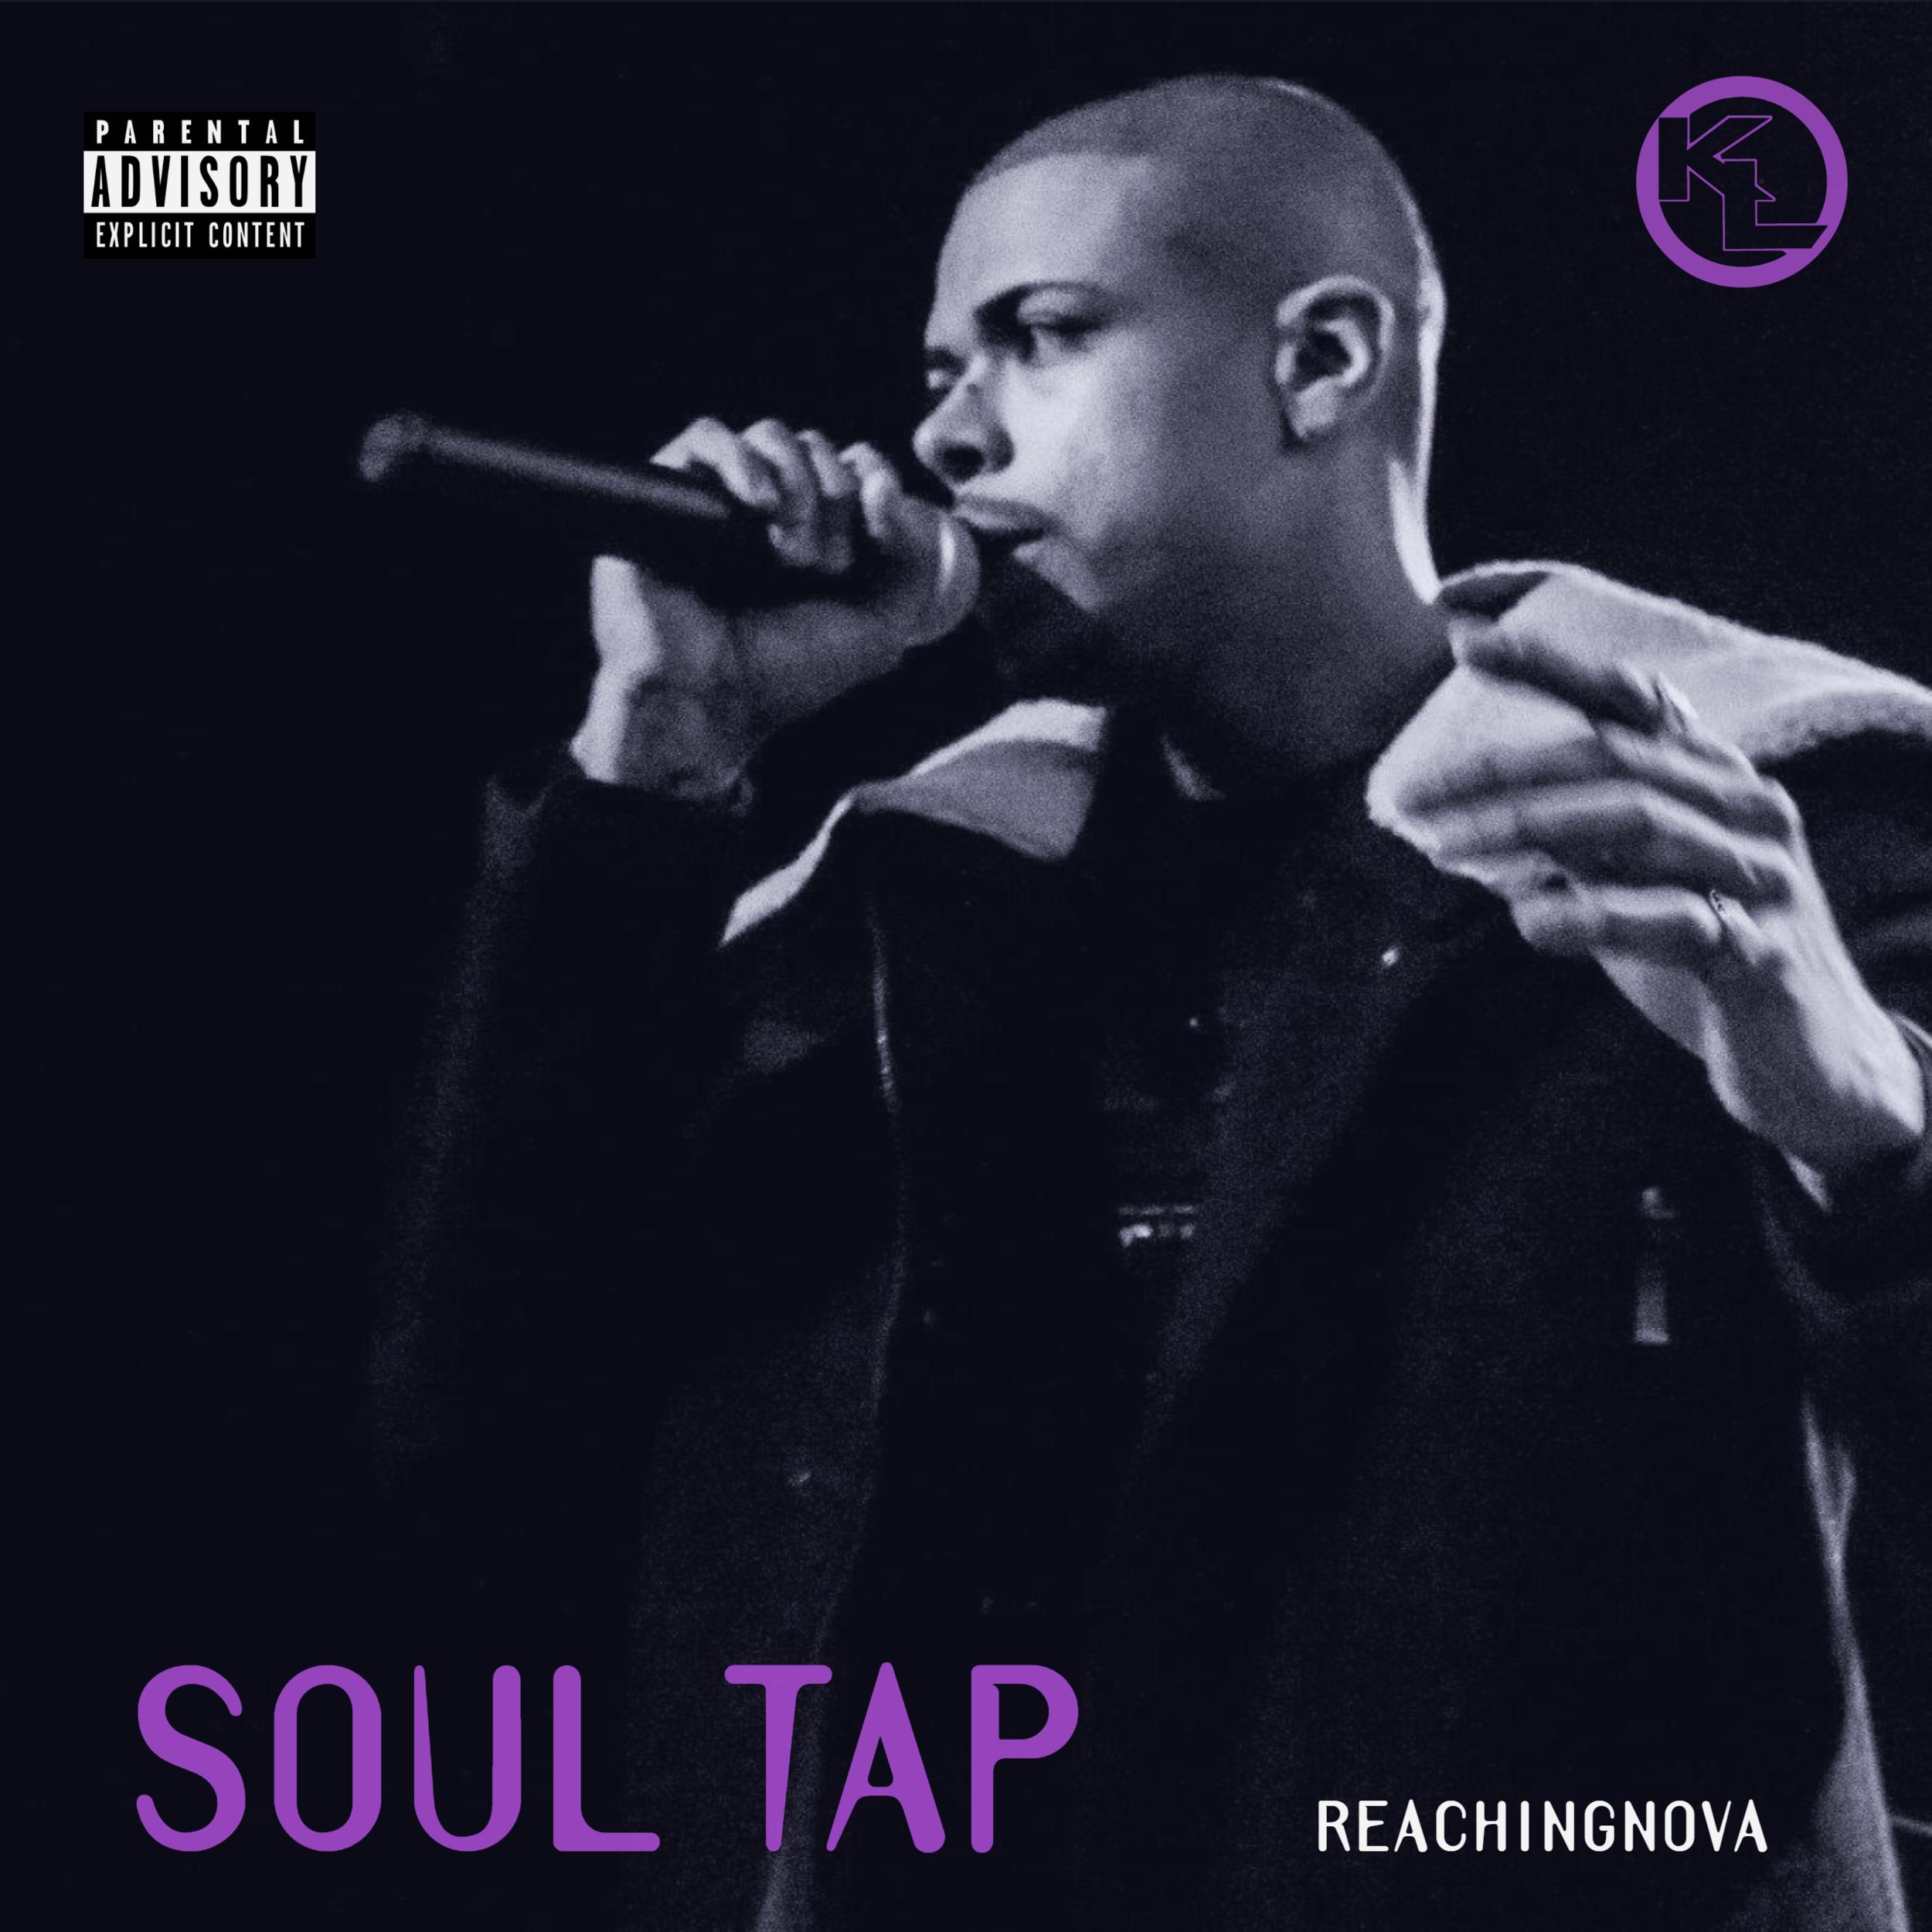 Soul Tap (cover art).png